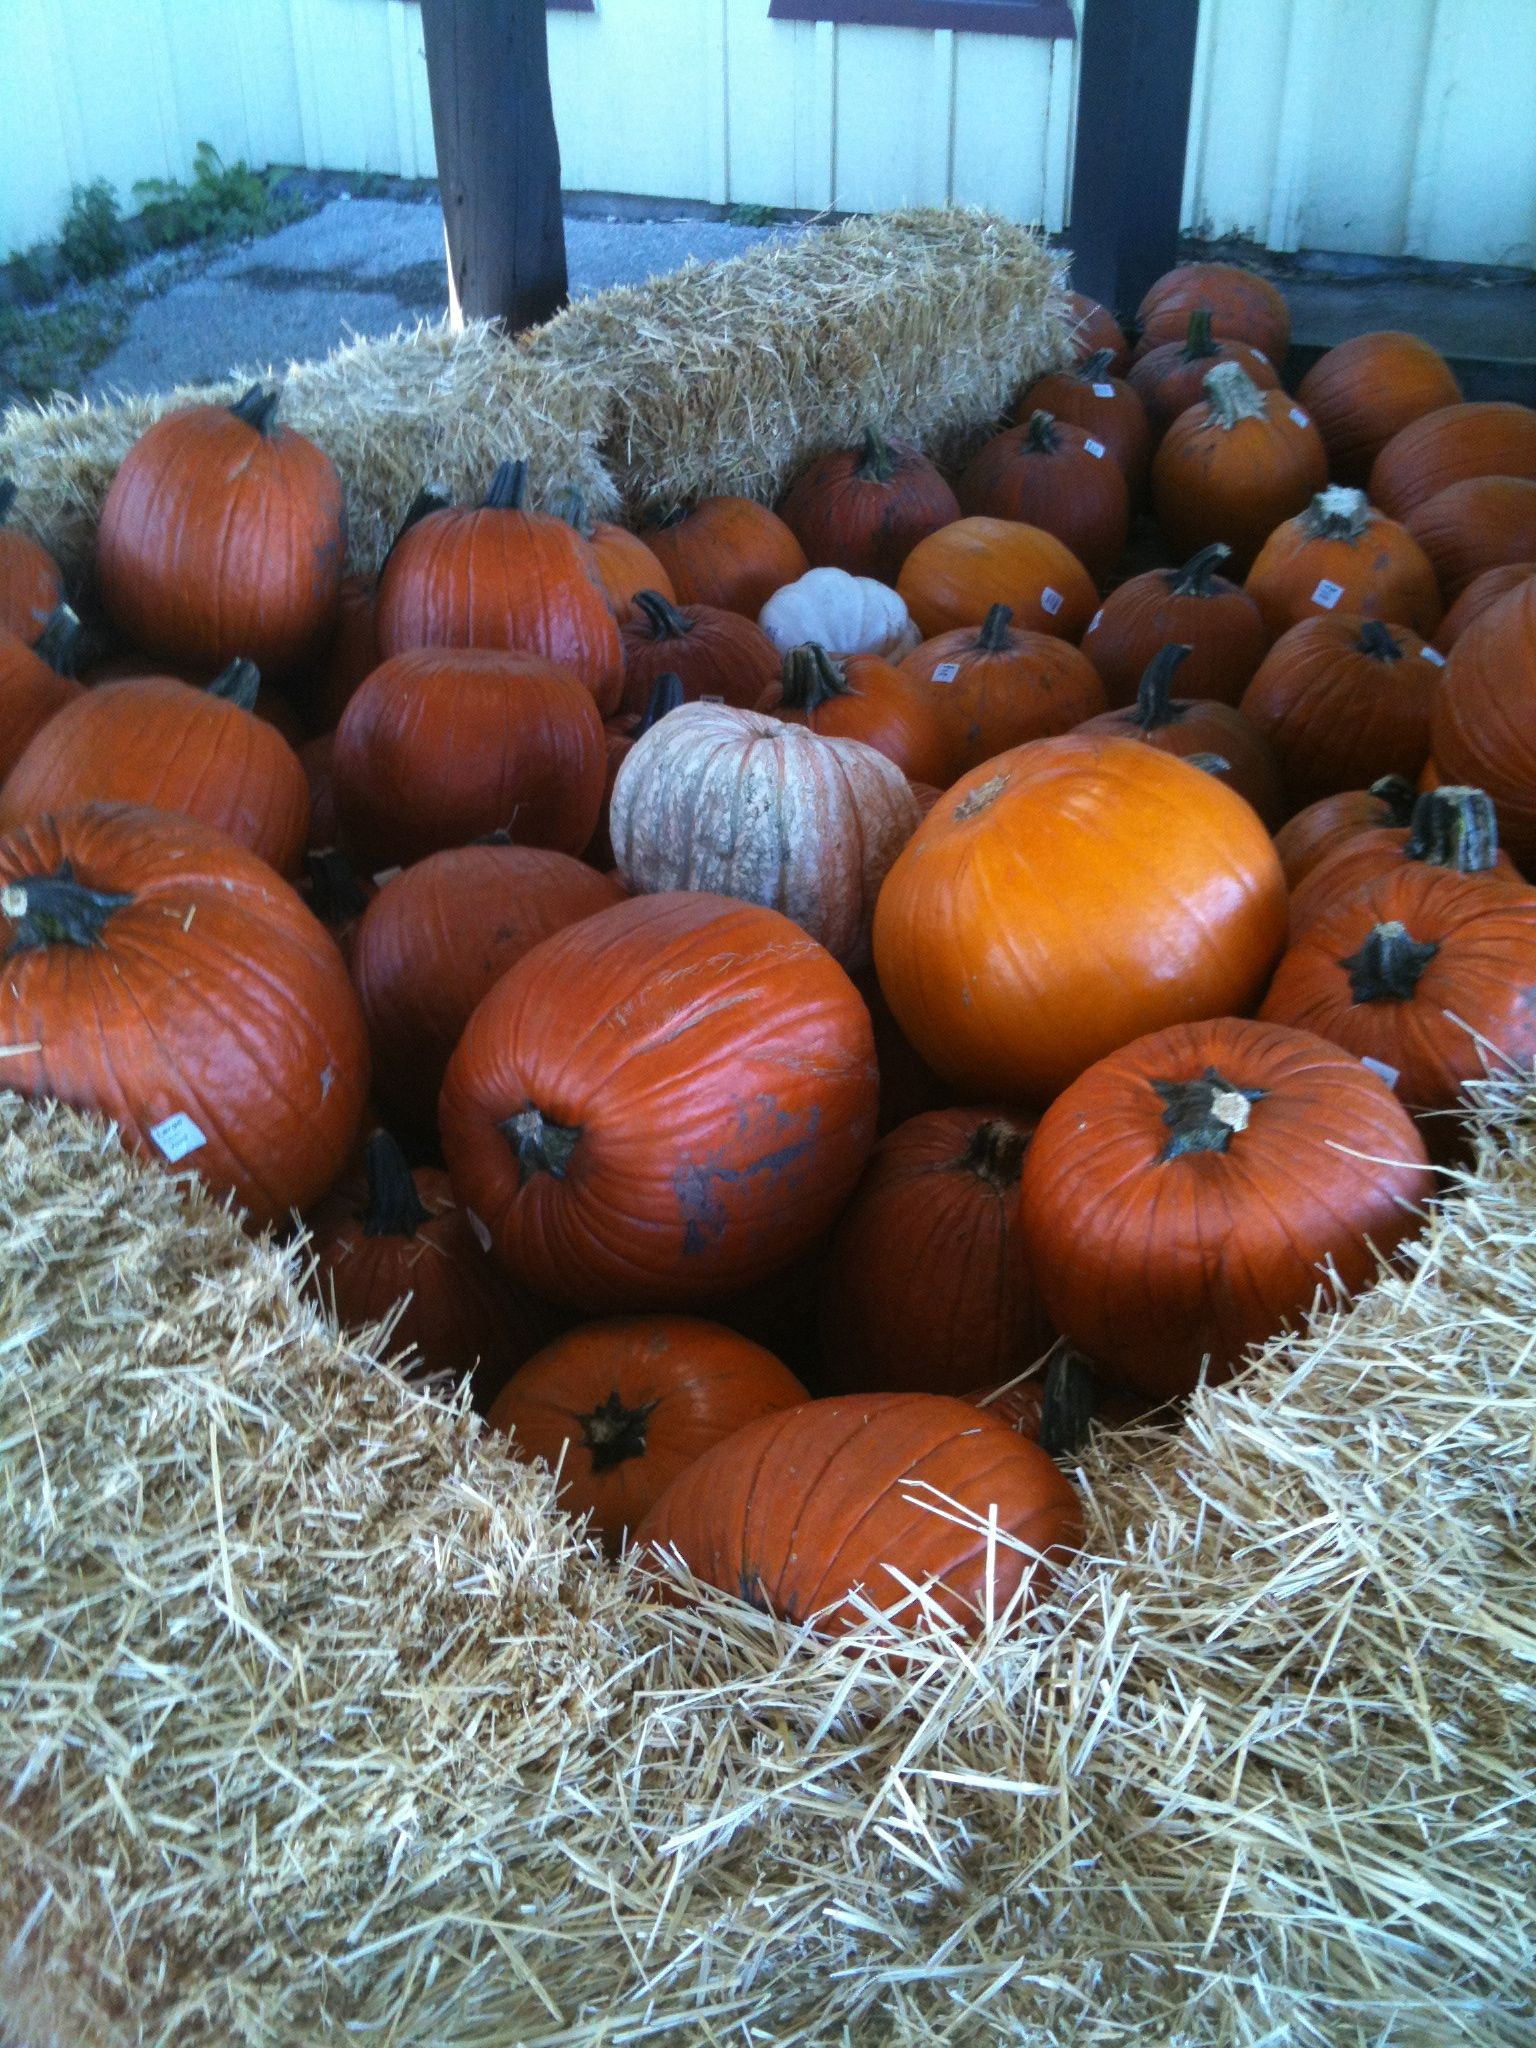 Pumpkin patches, Mukwanago, Wisconsin, late September 2012